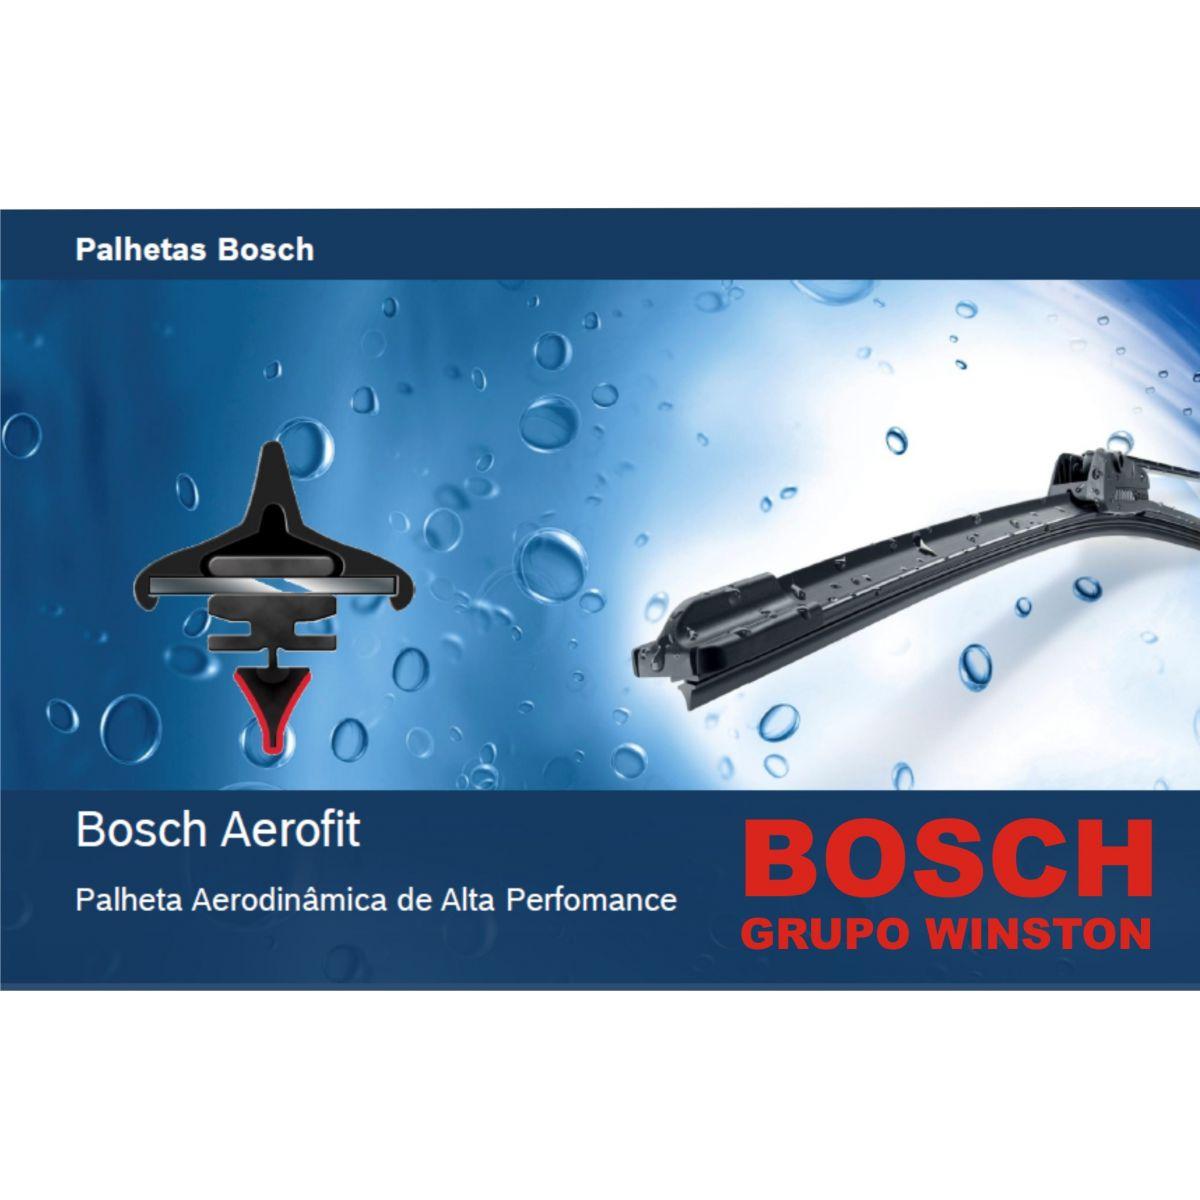 Palheta Bosch Aerofit Limpador de para brisa Bosch SUBARU Forester Legacy